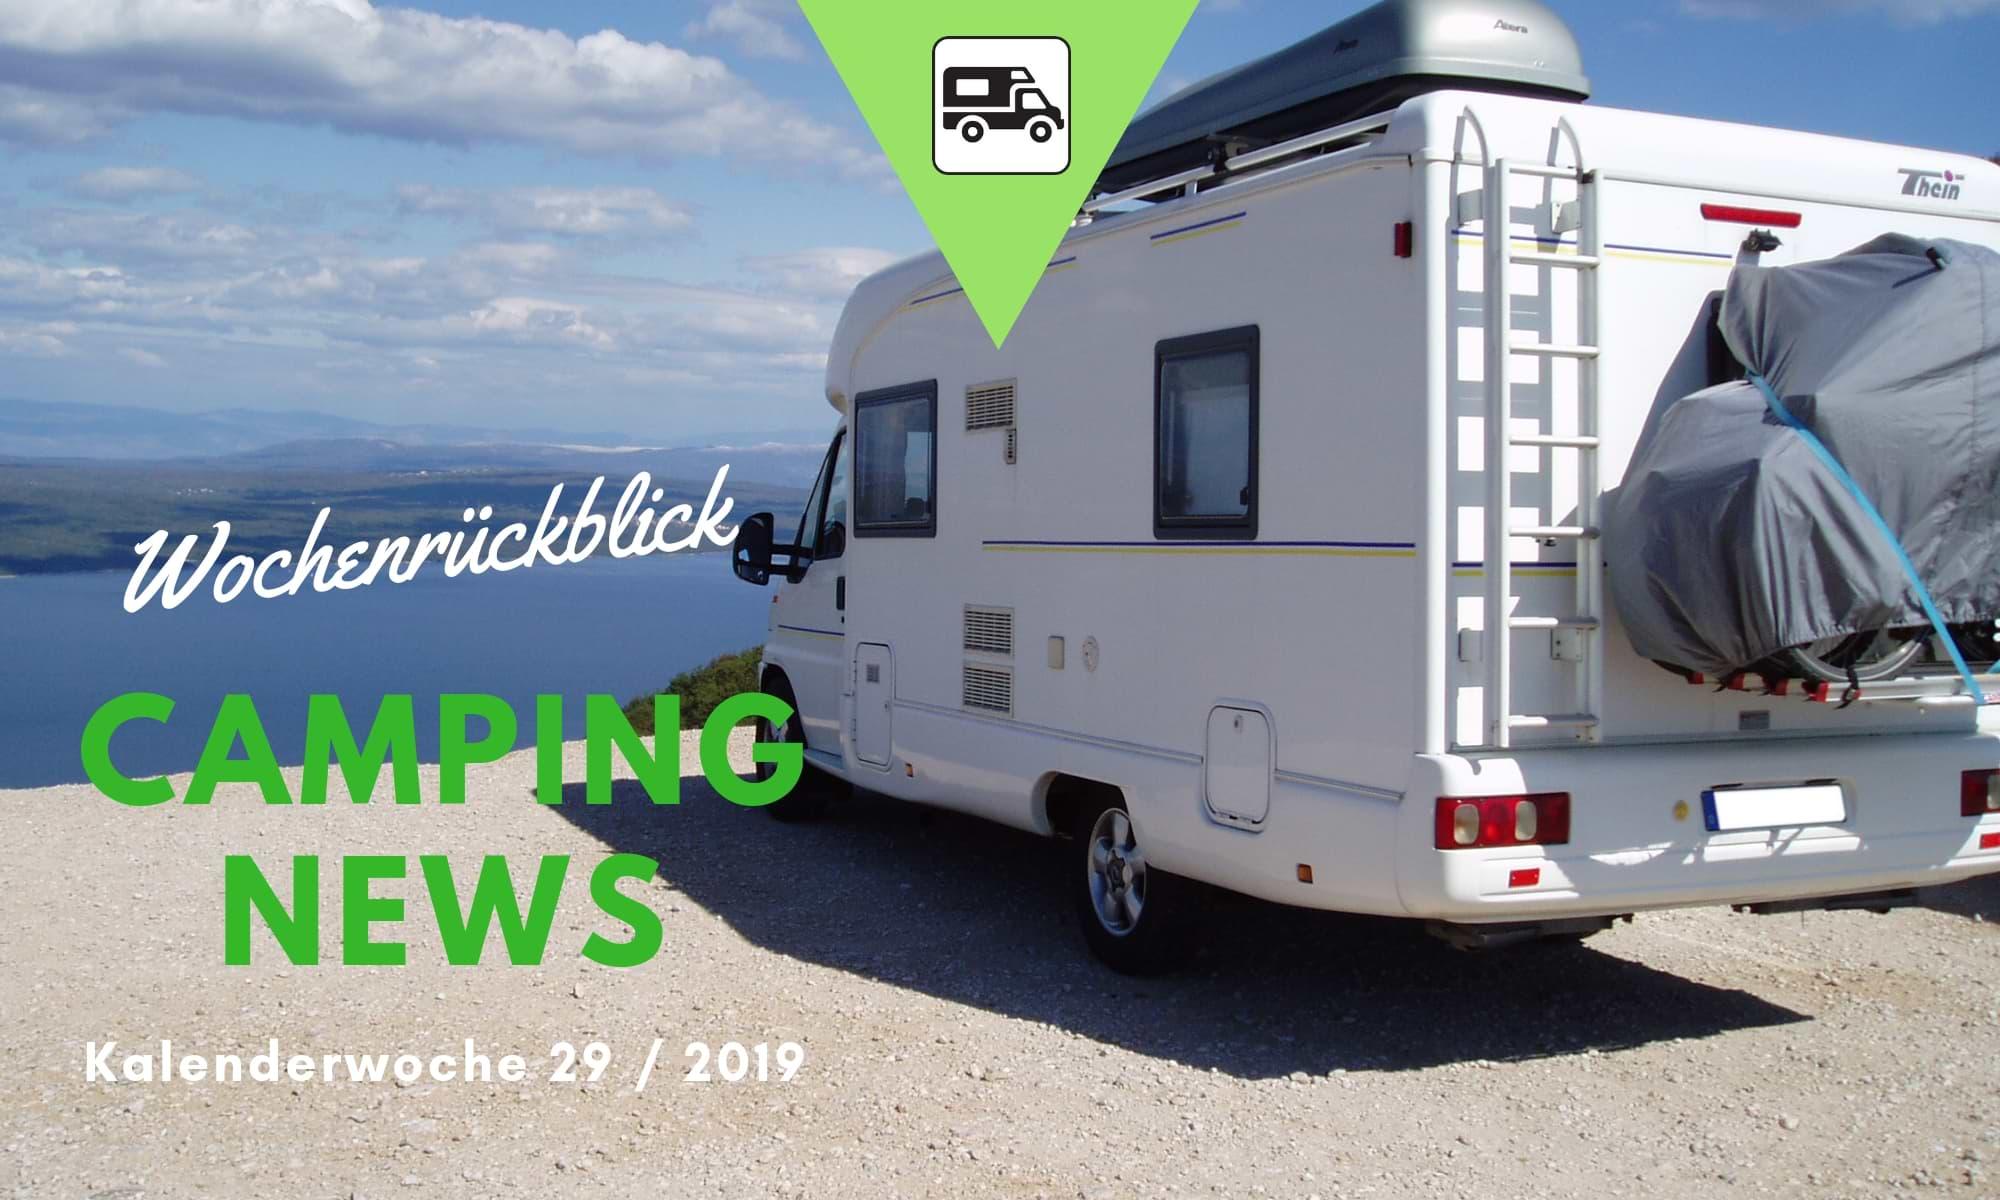 Wochenrückblick Camping News KW29-2019